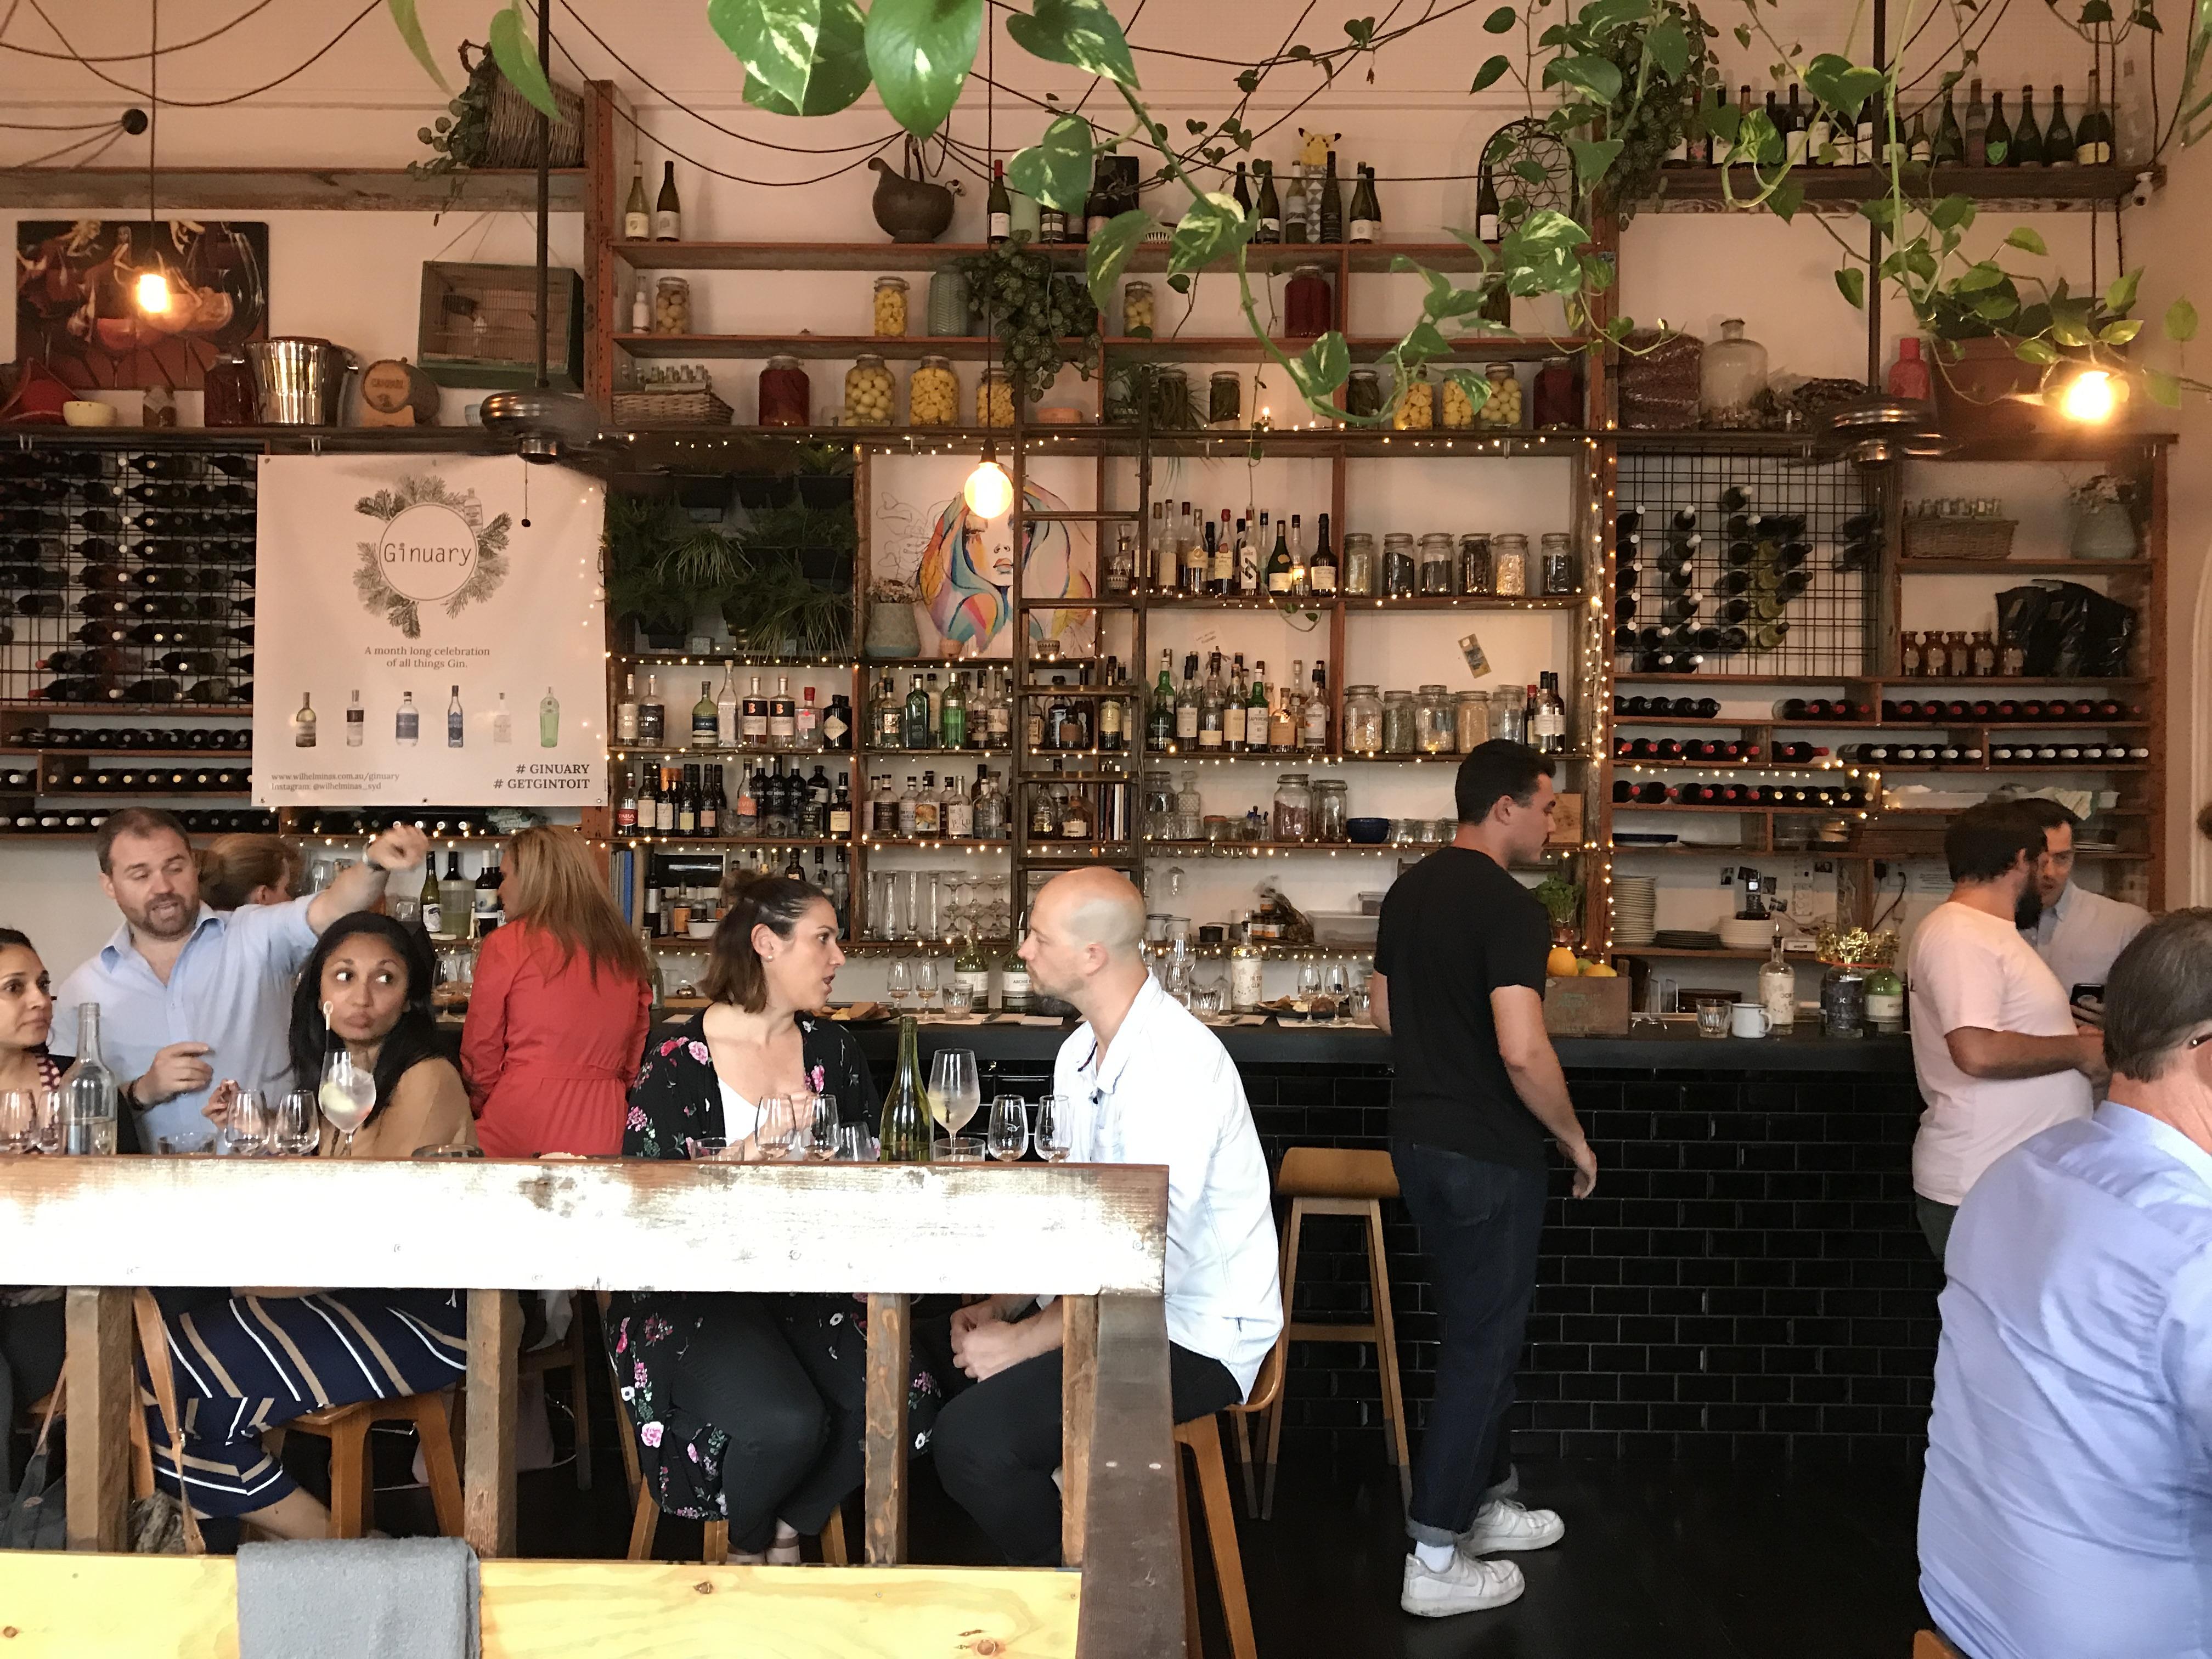 Wine Bar and Restaurant, Brand New Kitchen, Inner West Beach Suburb